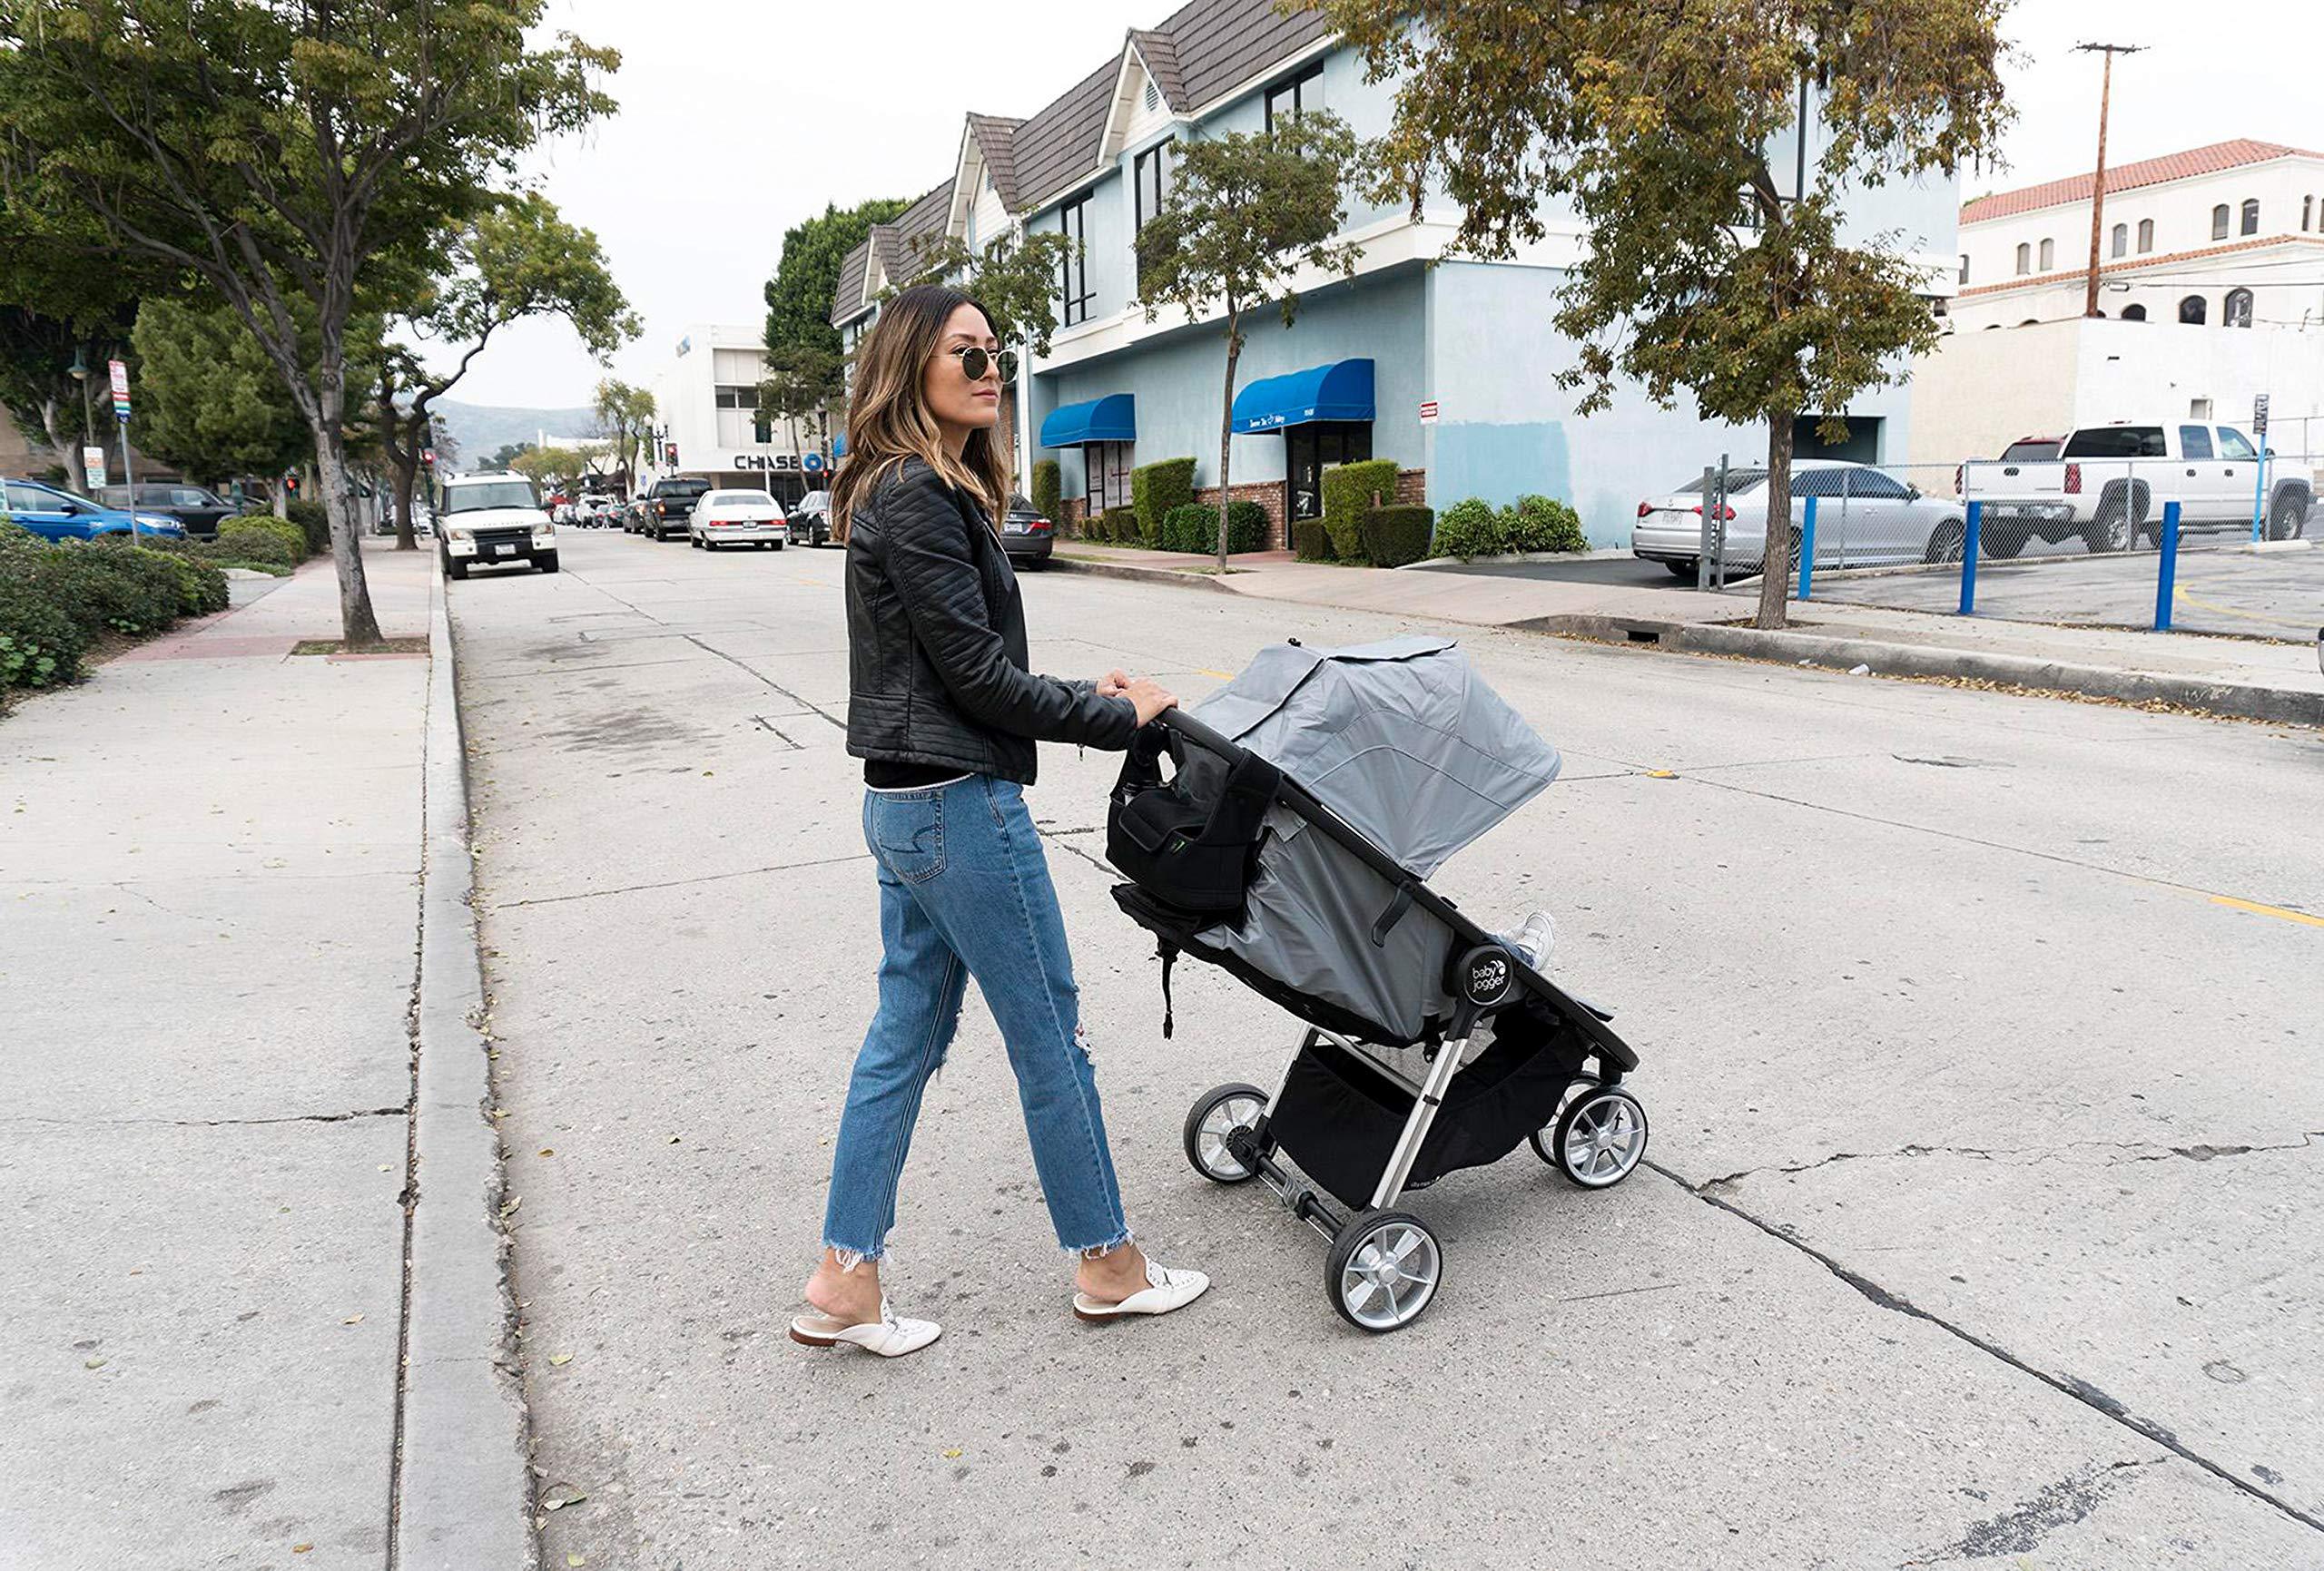 Baby Jogger City Mini 2 Stroller - 2019   Compact, Lightweight Stroller   Quick Fold Baby Stroller, Carbon by Baby Jogger (Image #11)